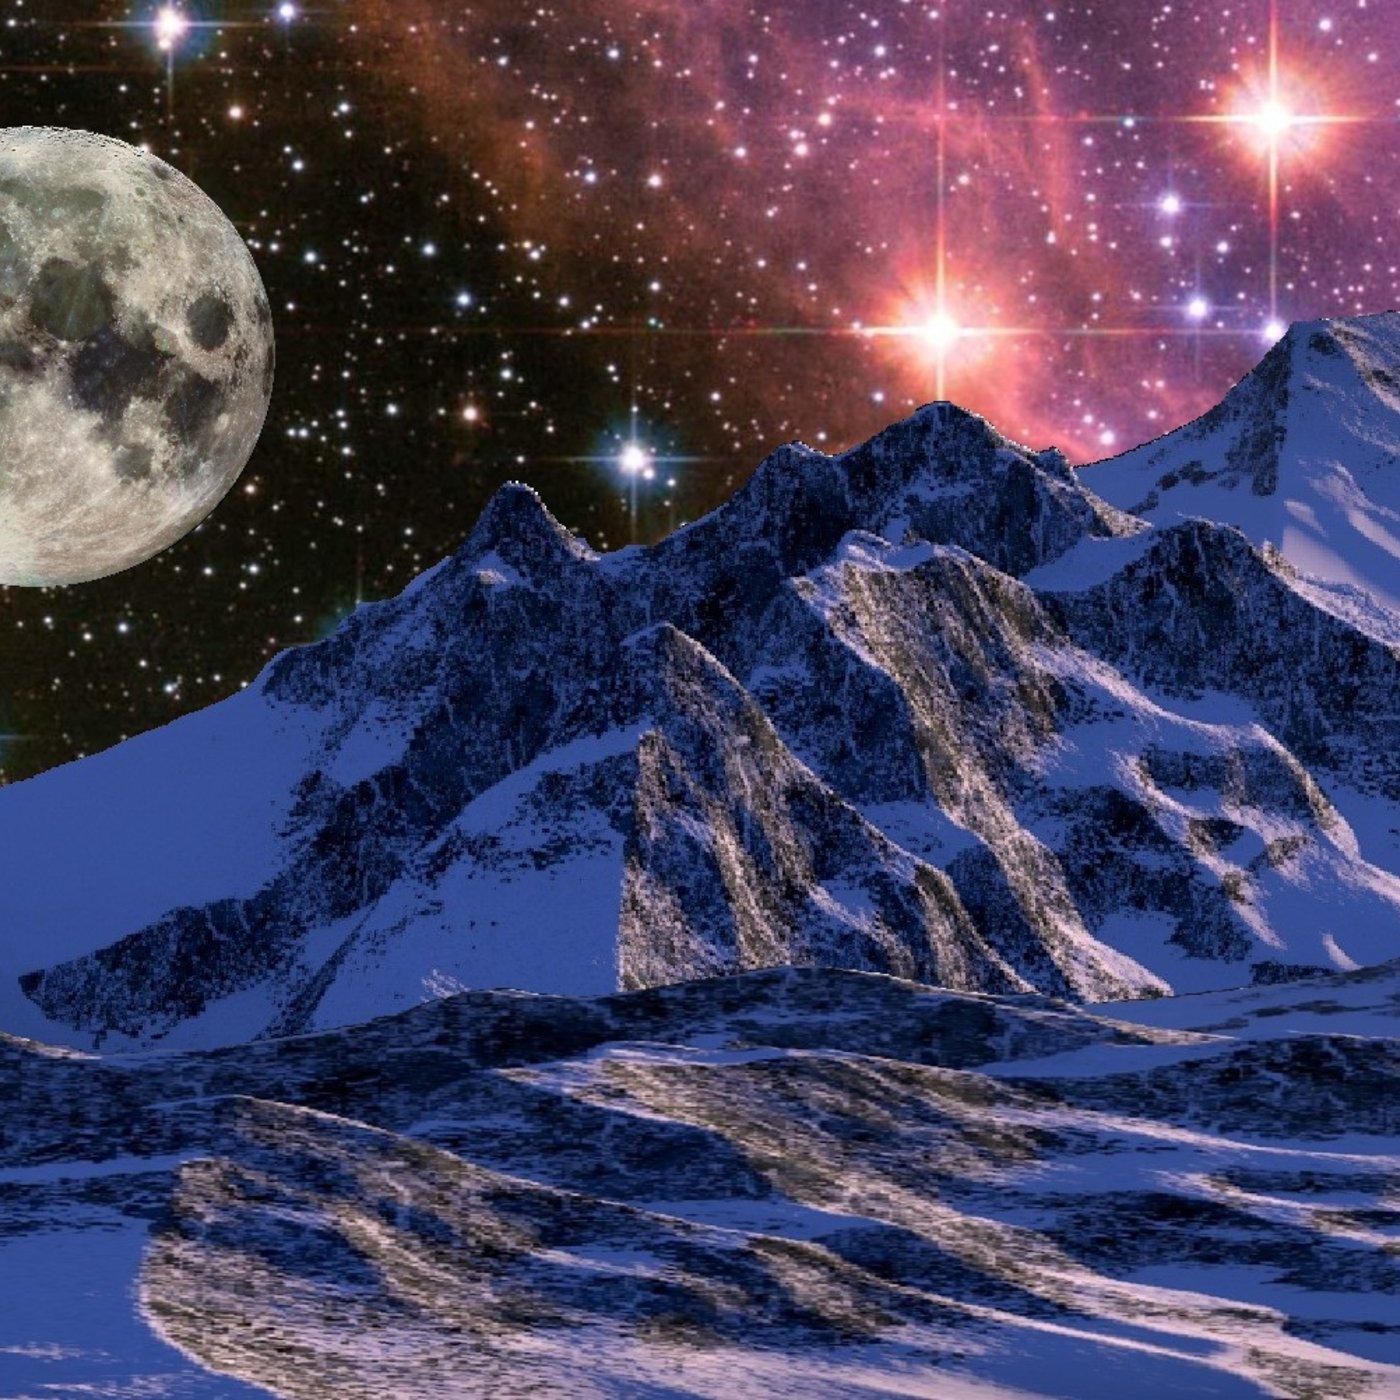 Mountain Snow, Moon and Stars